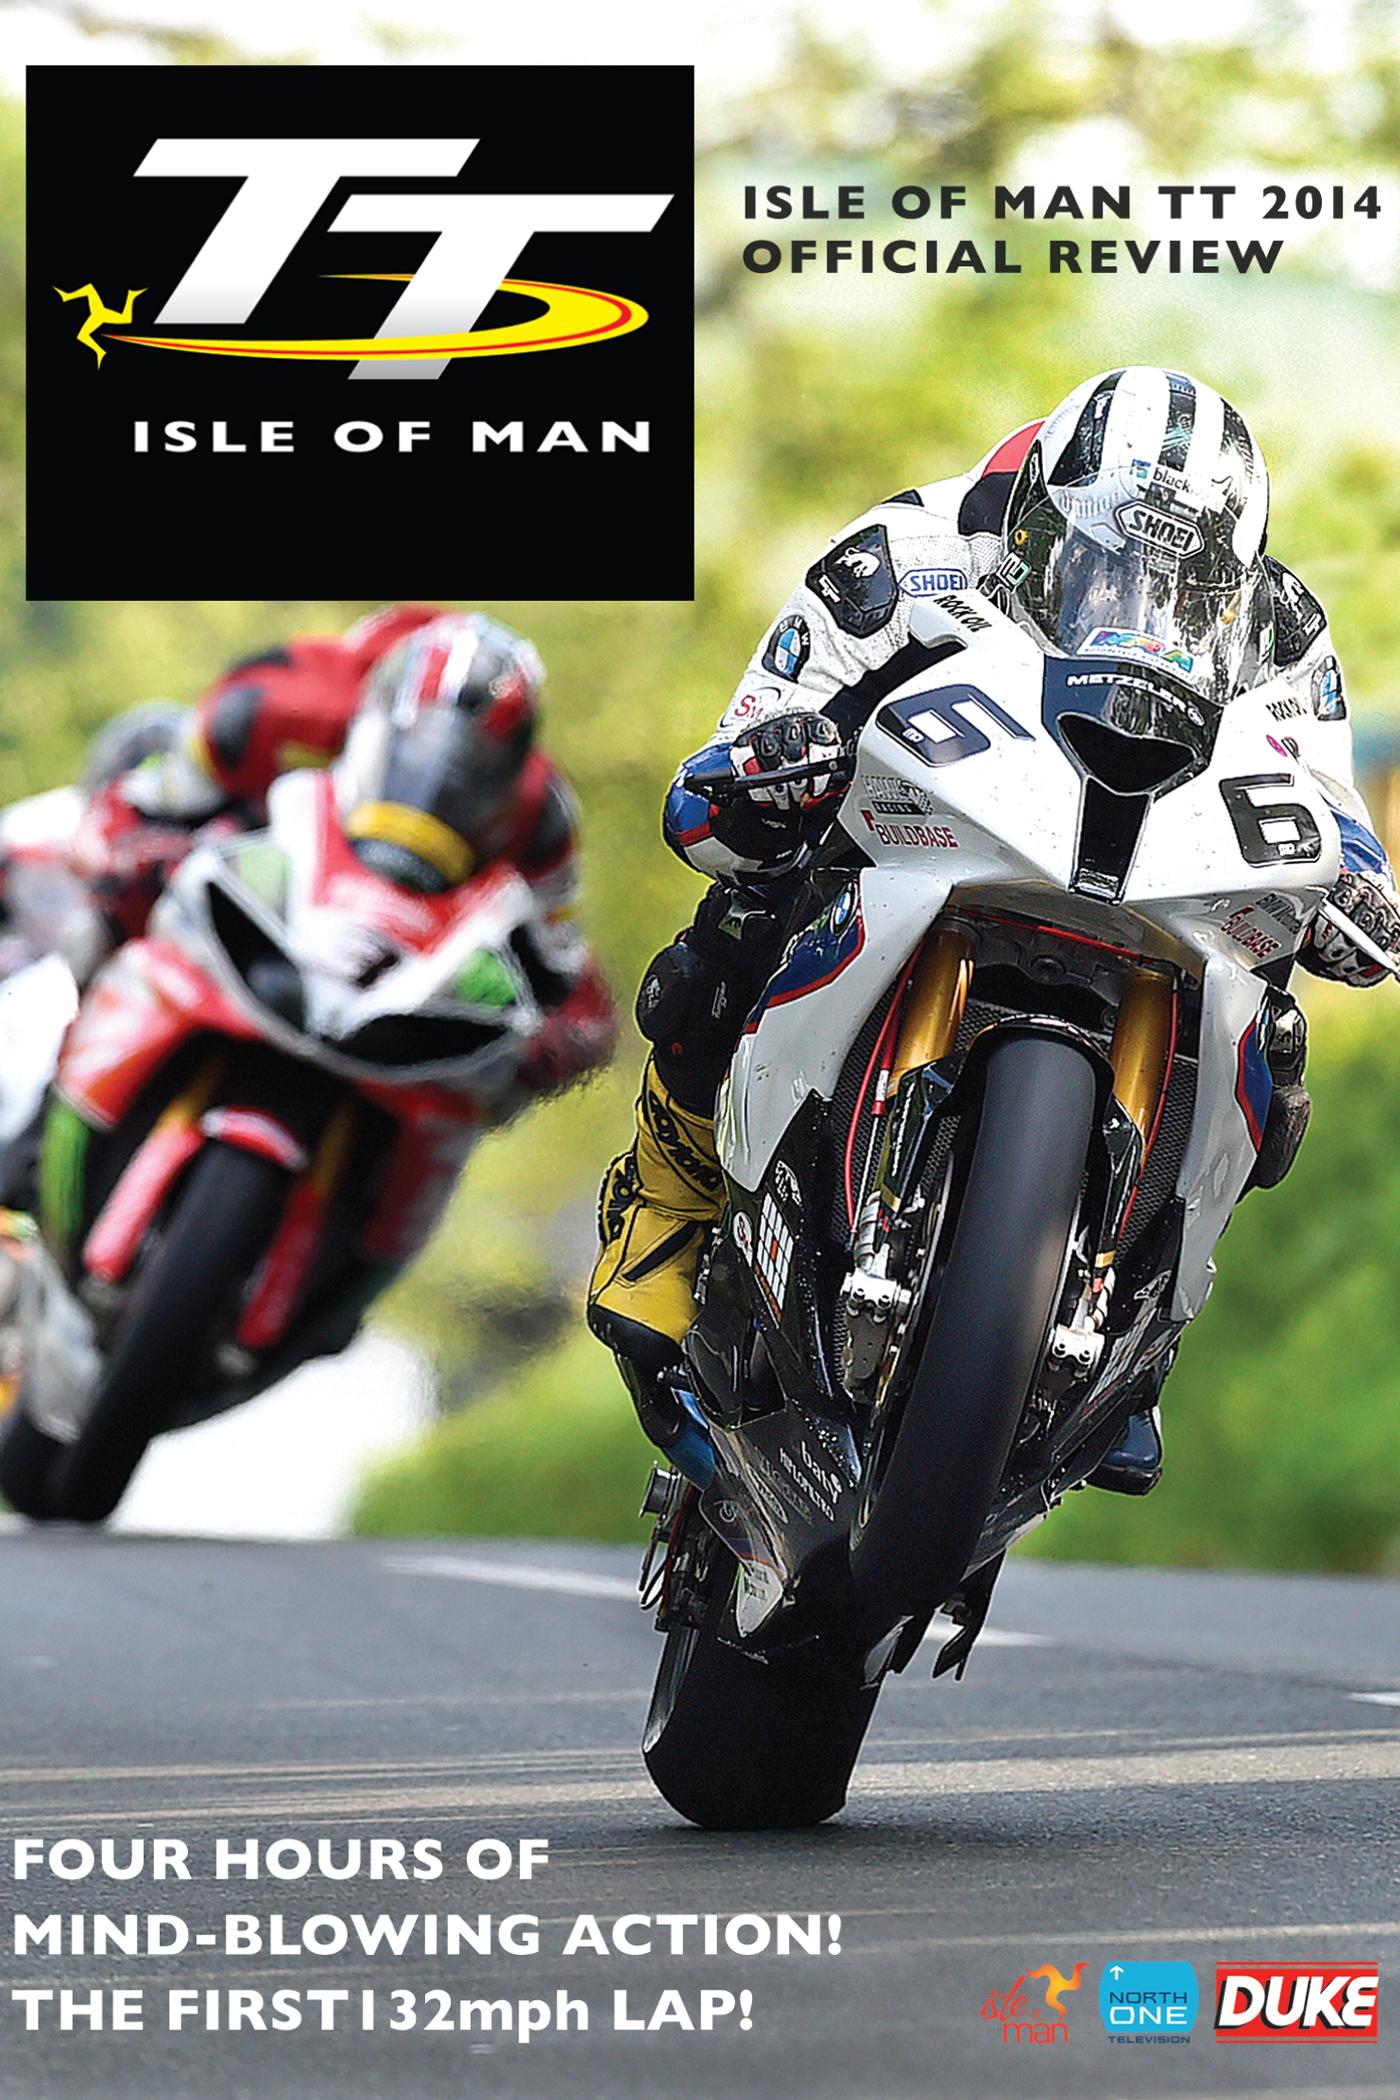 Isle of Man TT Review 2014